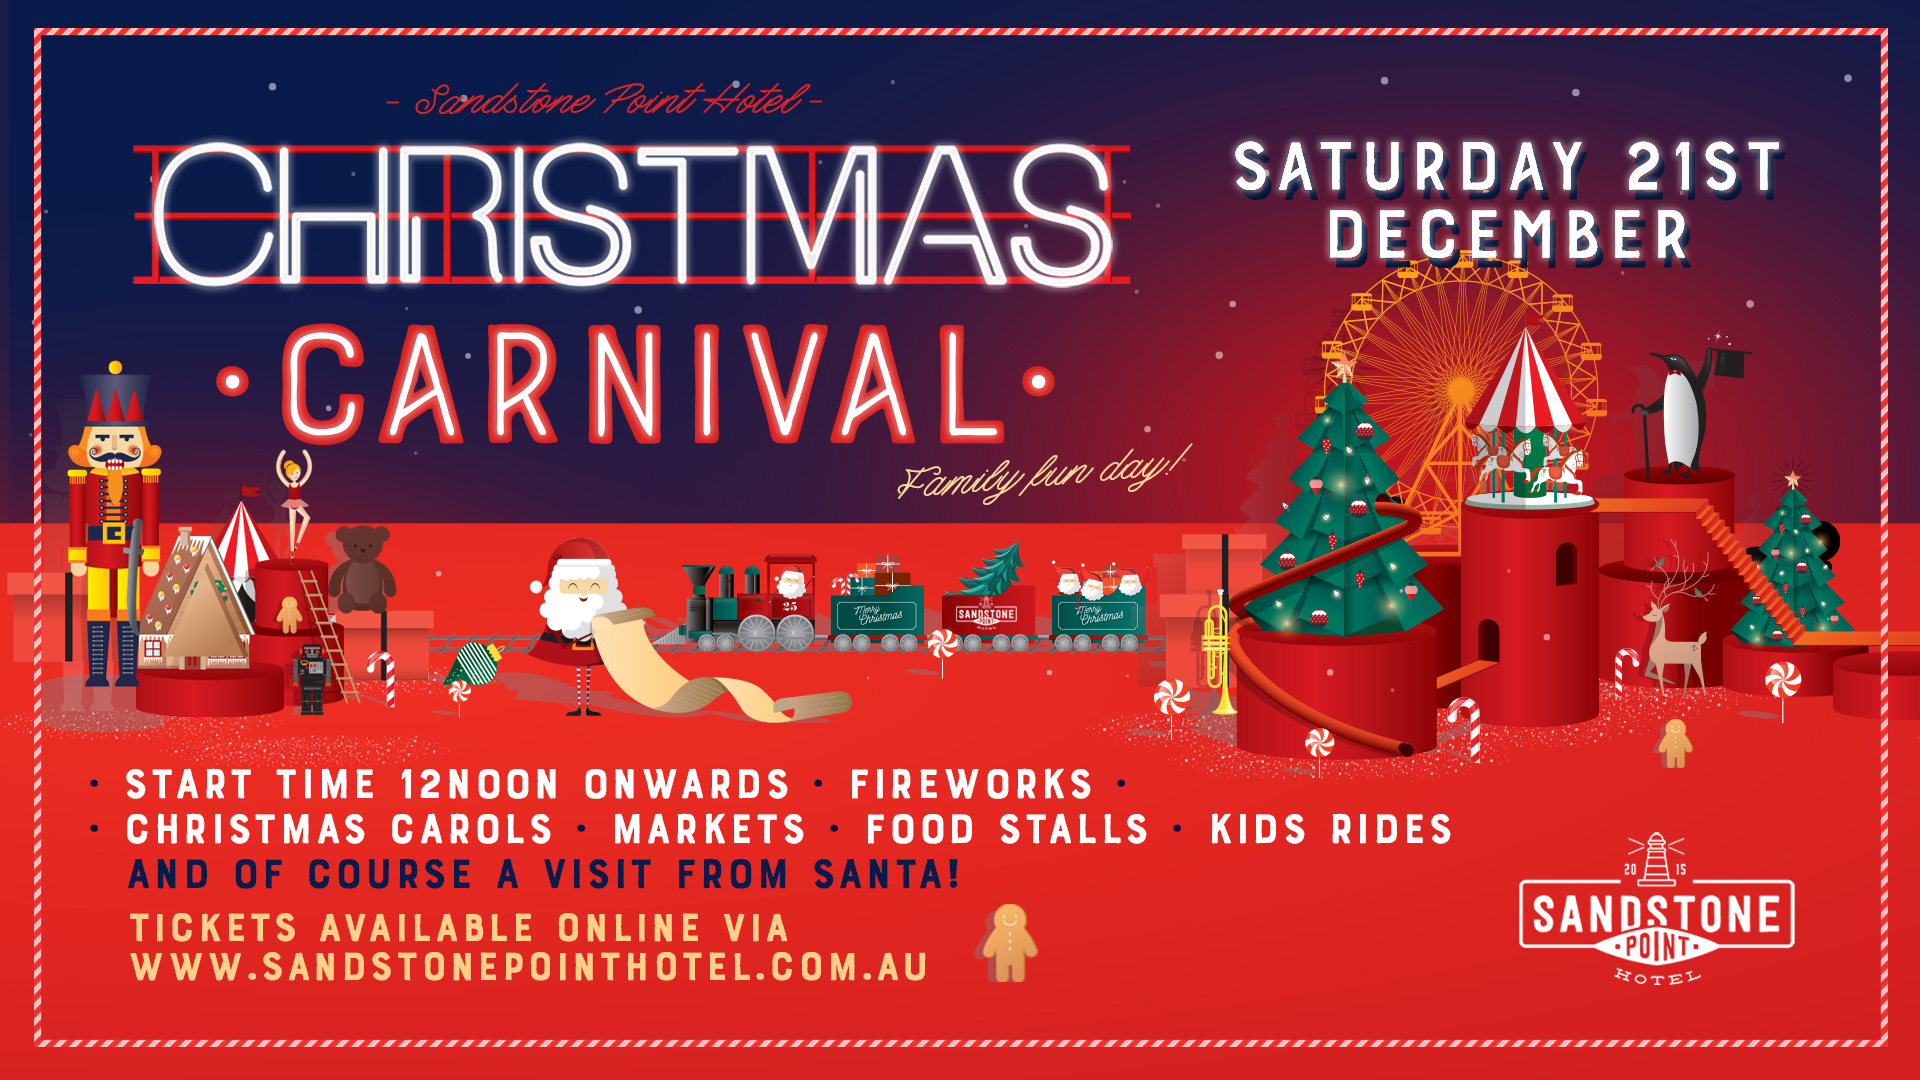 Christmas Eve 2019.Christmas Carnival Sandstone Point Hotel